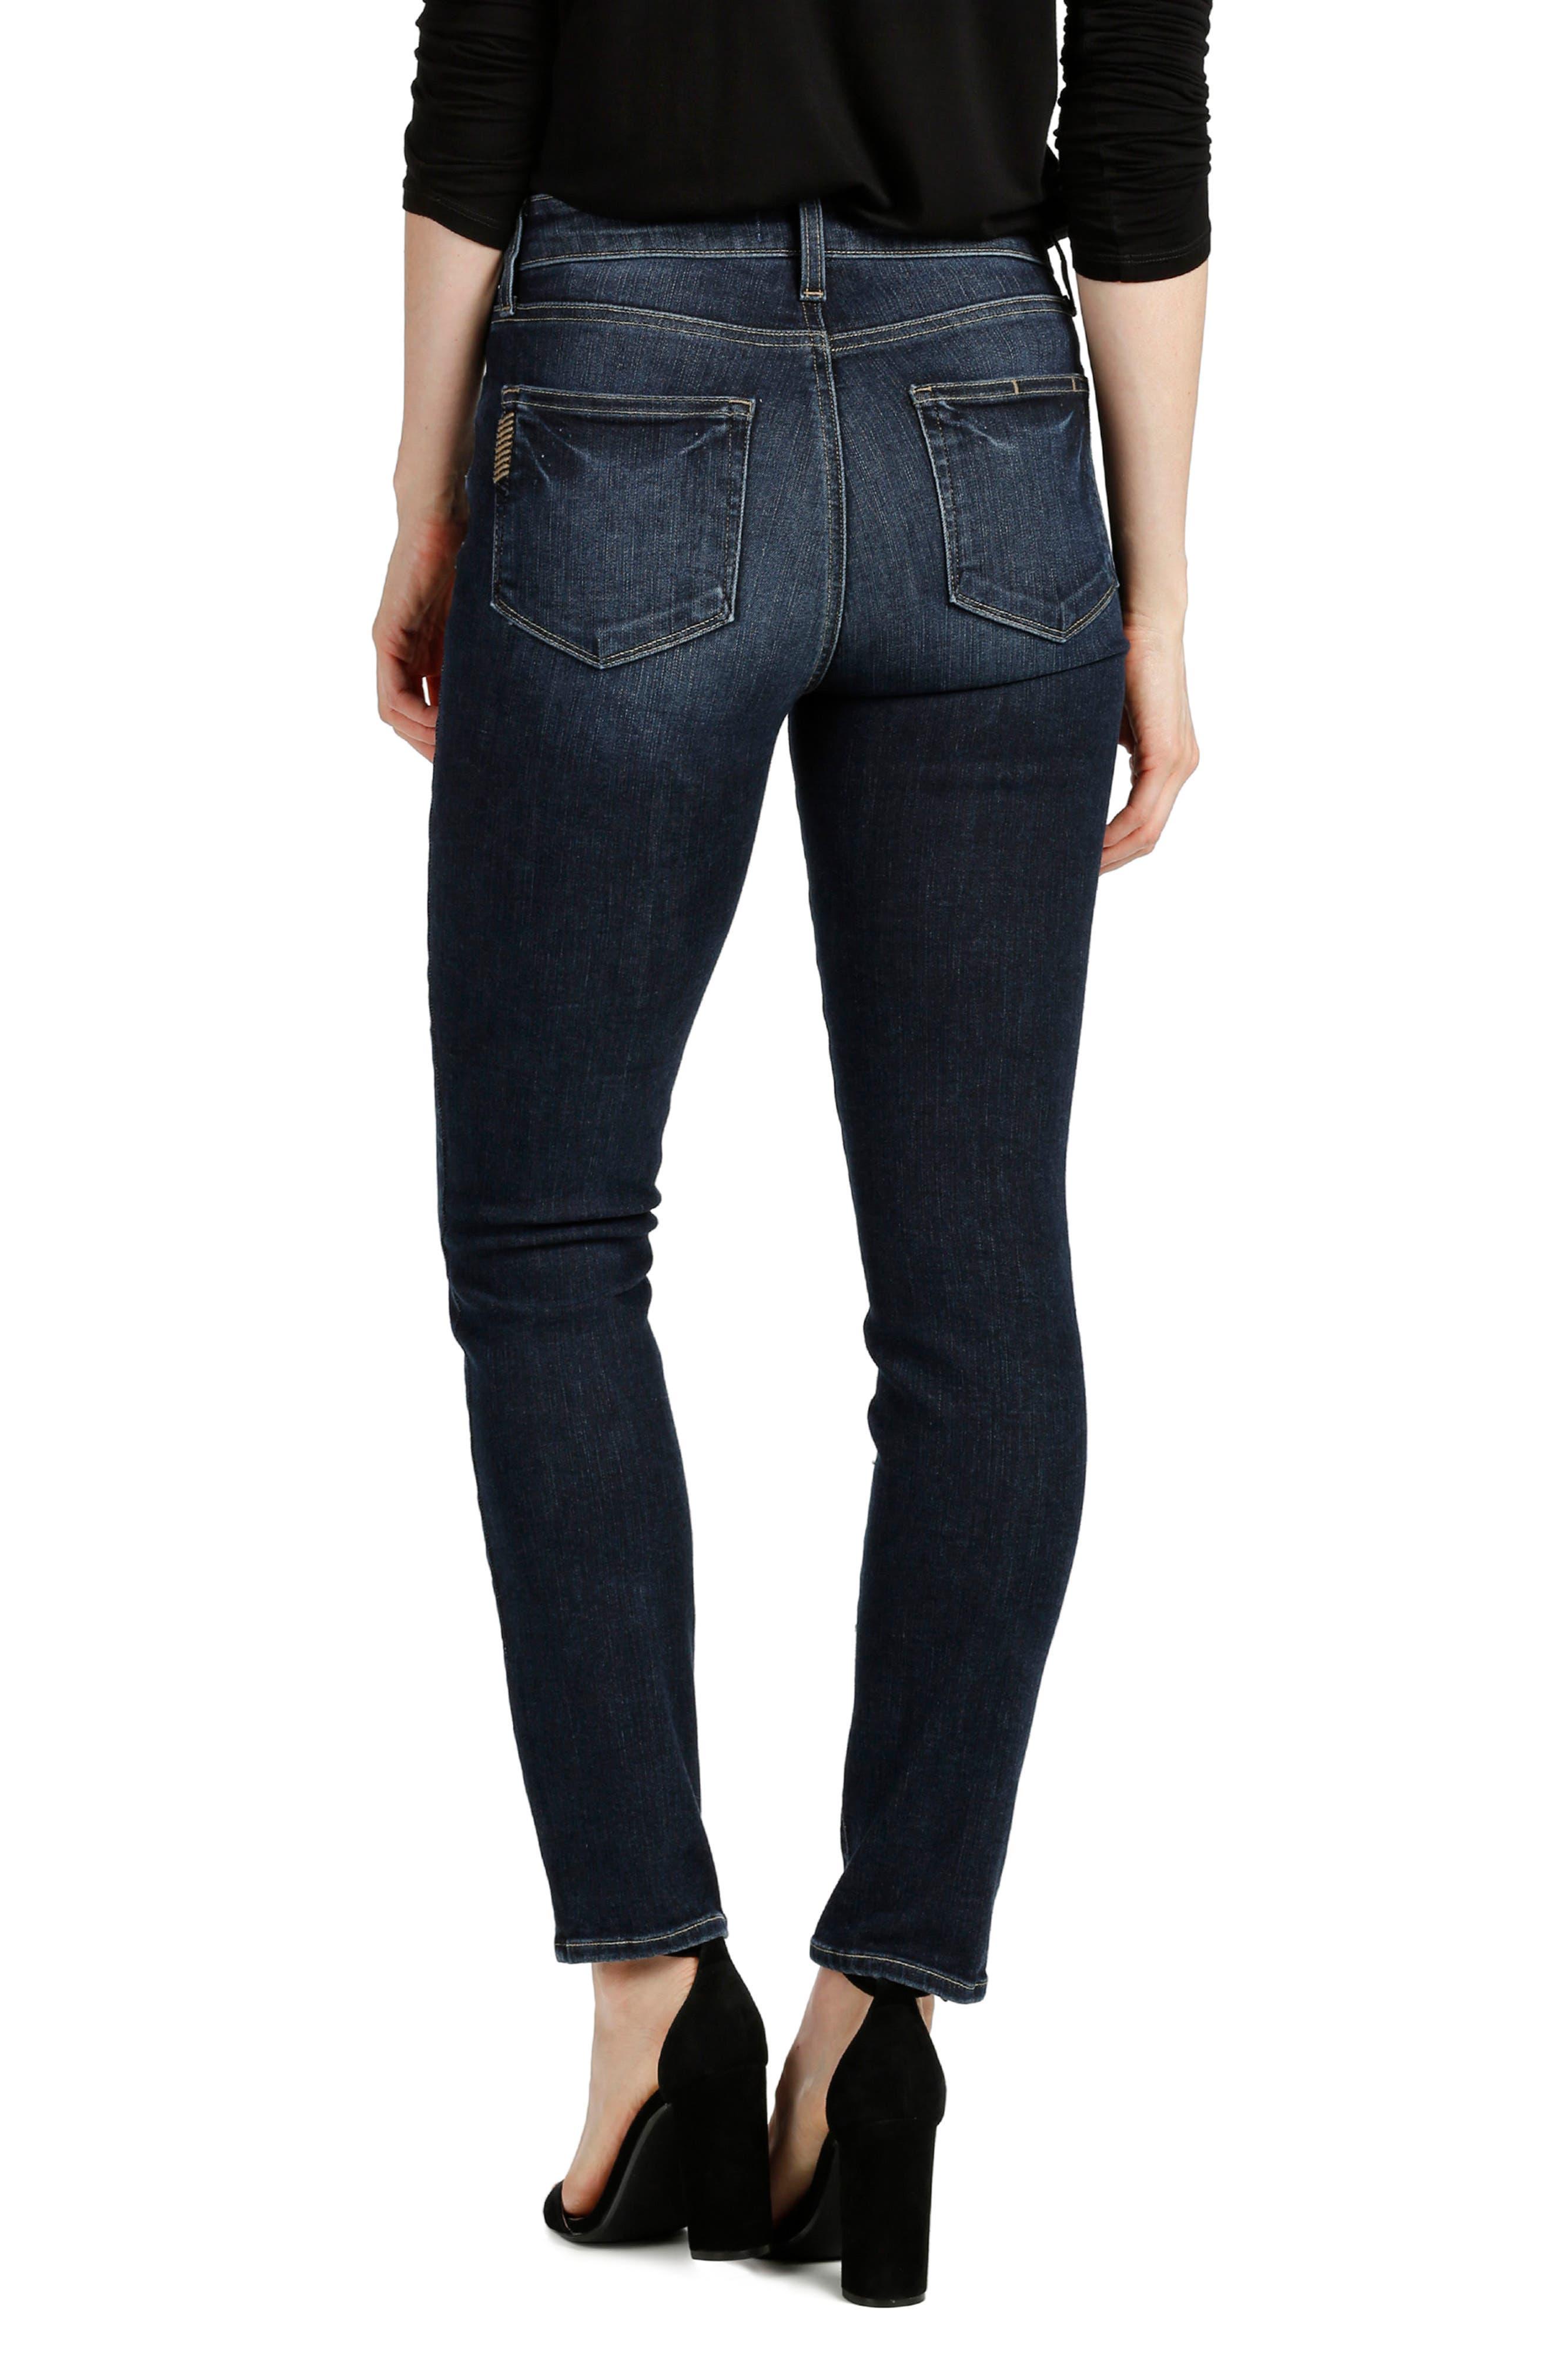 Transcend Vintage - Hoxton Ankle Peg Skinny Jeans,                             Alternate thumbnail 2, color,                             Jerry Girl